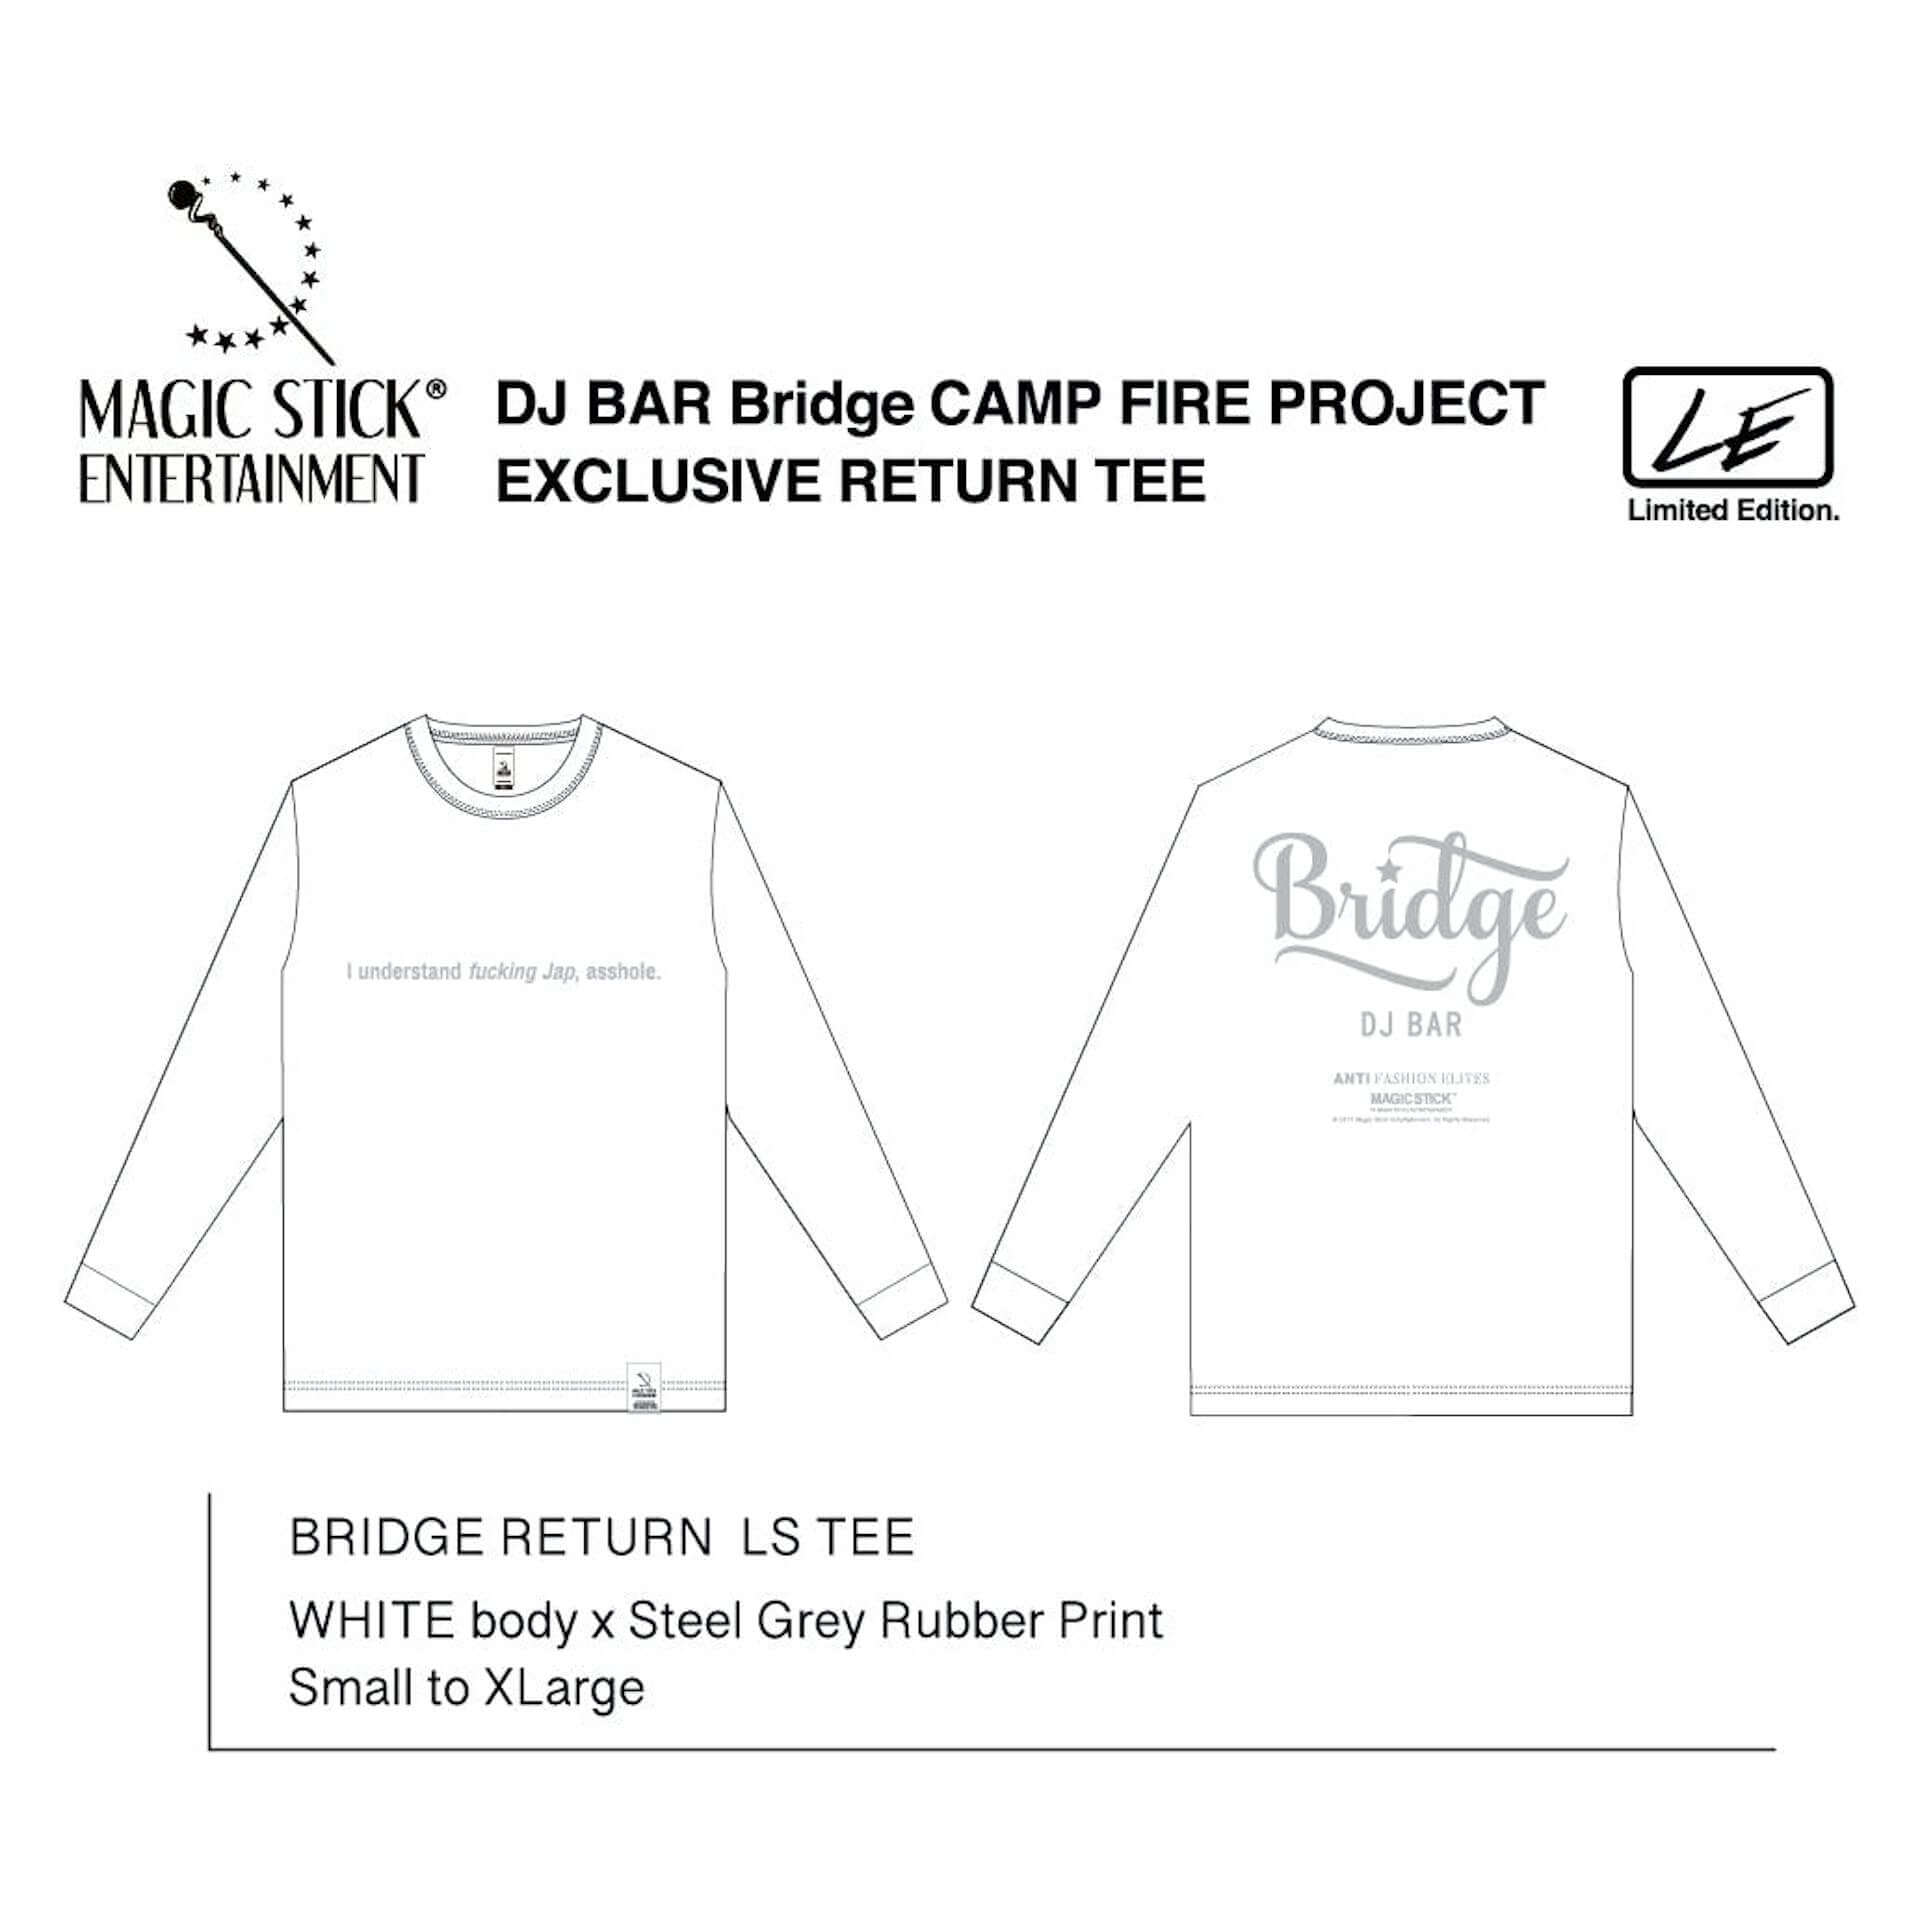 DJ BAR Bridgeが、店舗存続のための緊急支援をクラウドファンディングで募集中!リターンには非売品Tシャツも music200525_bridge_fire_03-1920x1922